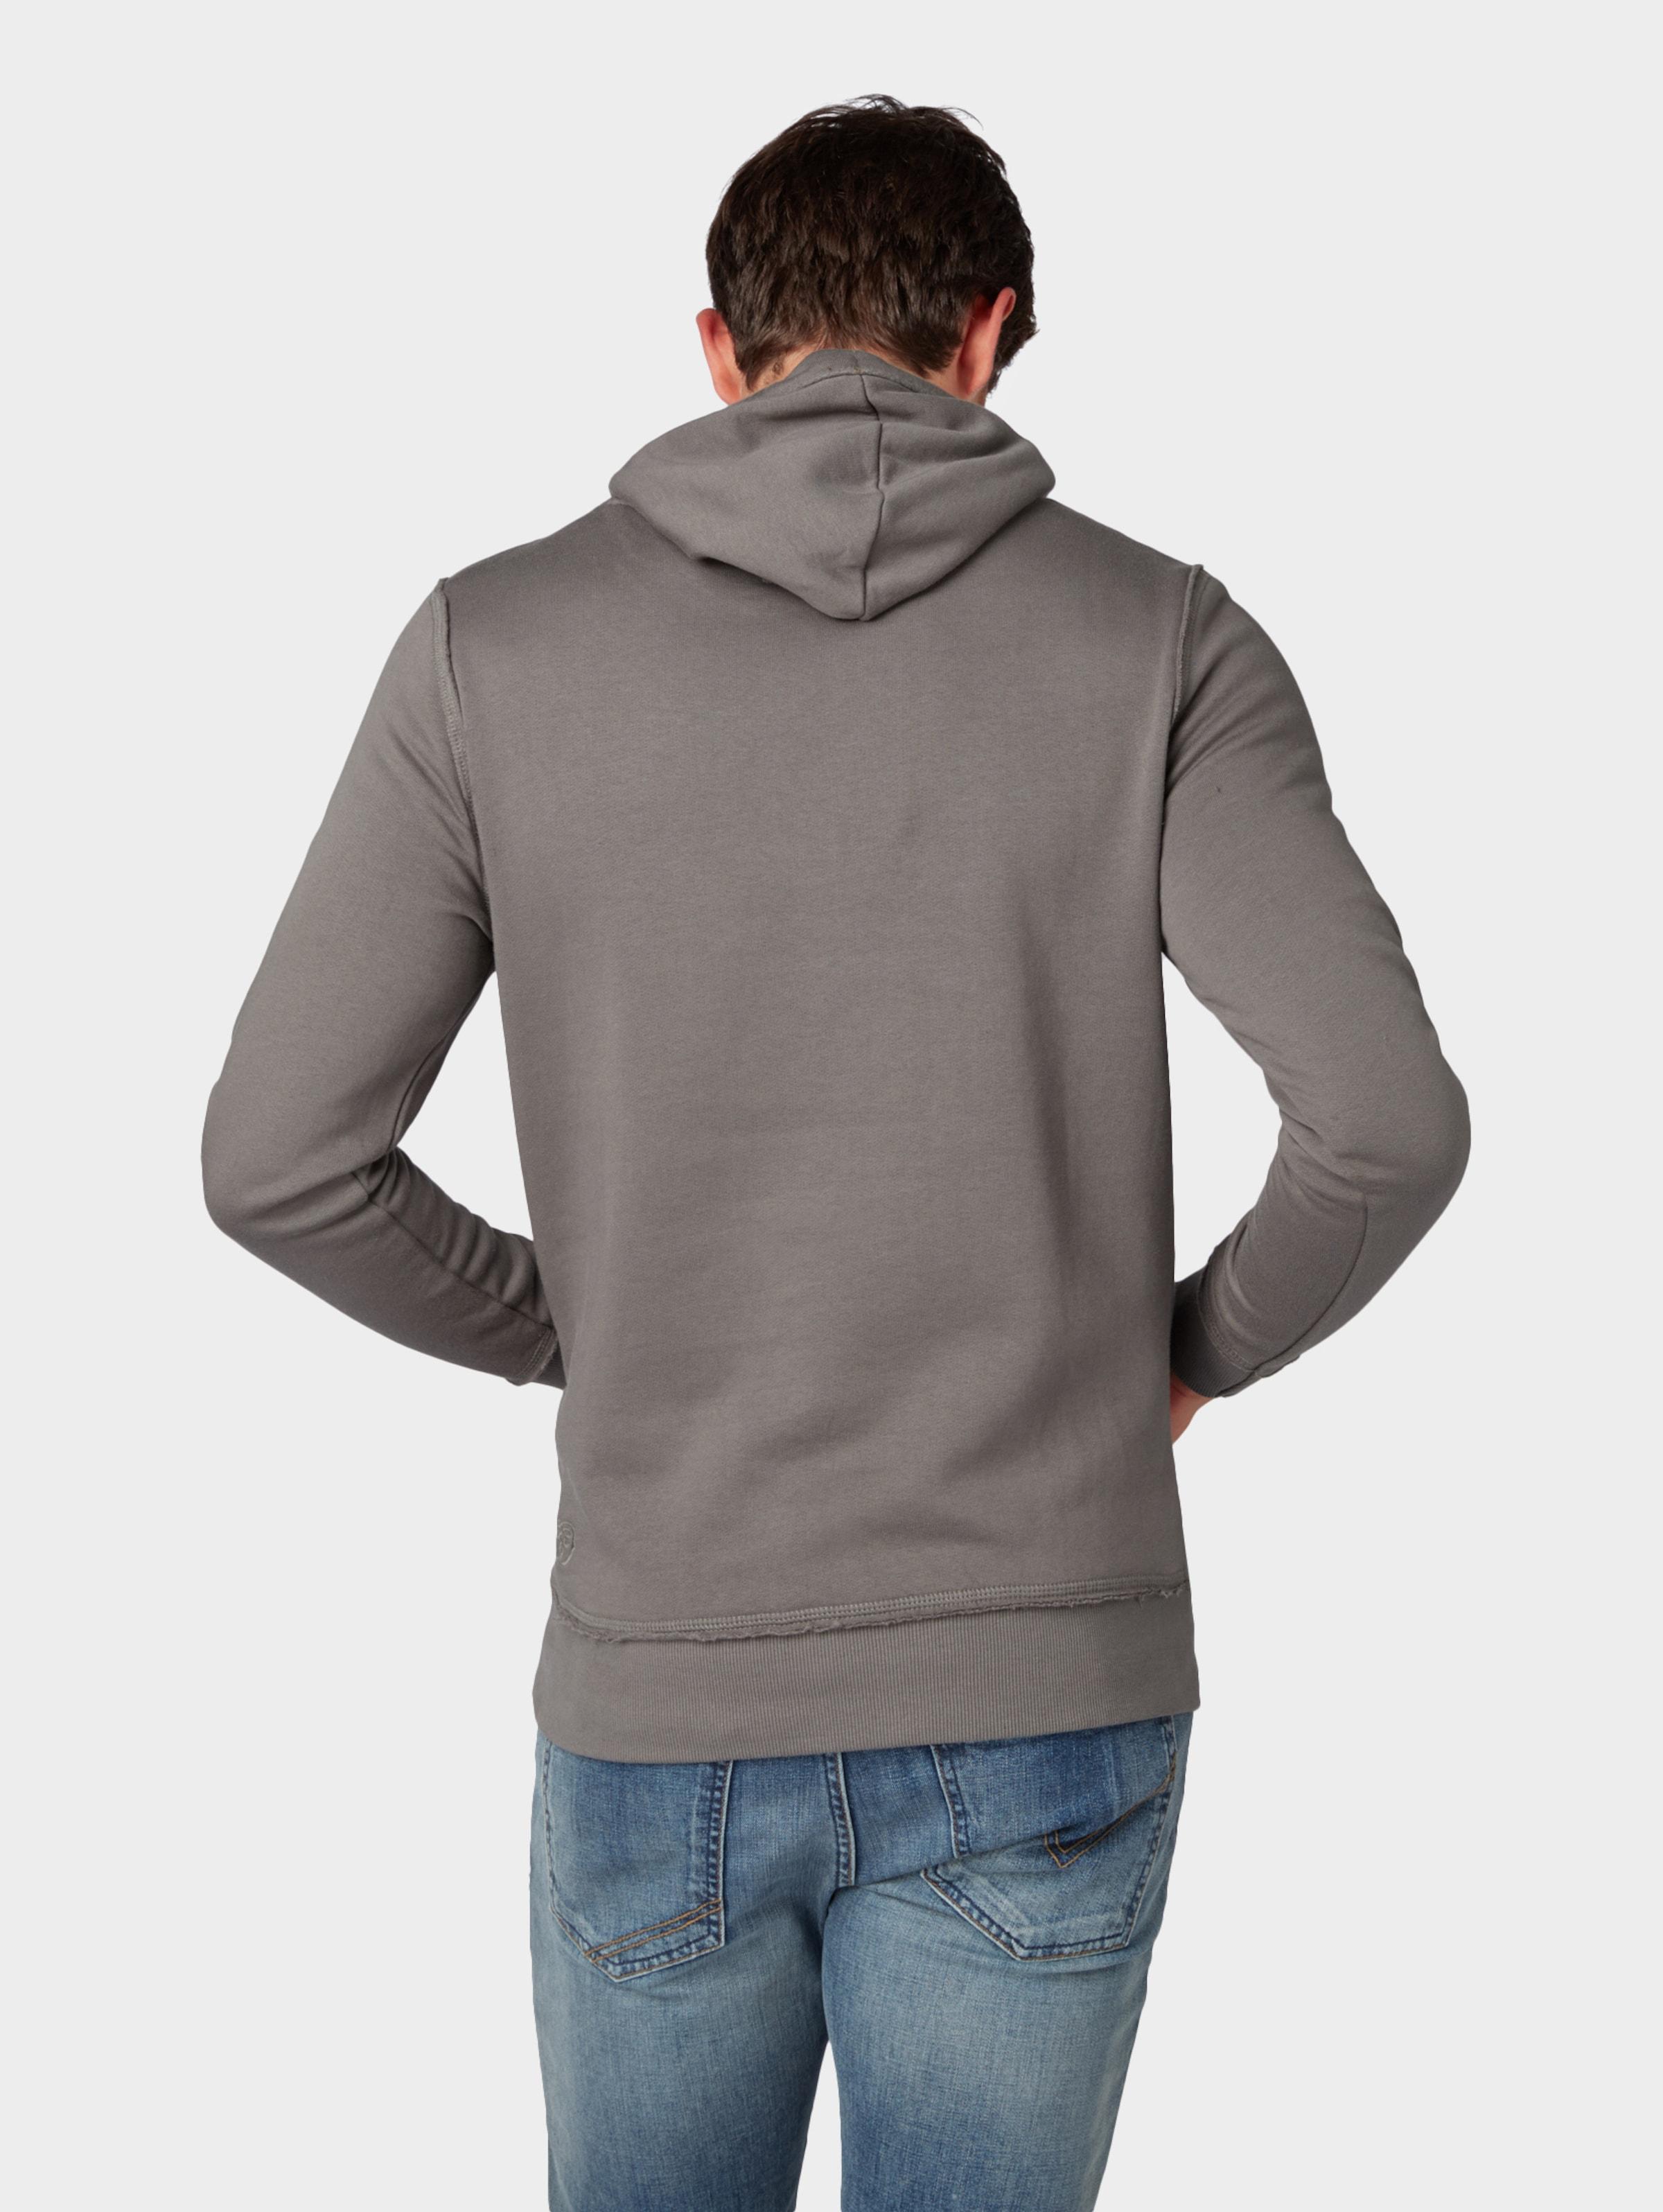 Sweatshirt Tailor Denim Tom GelbTaupe Schwarzmeliert In srQCxhdt